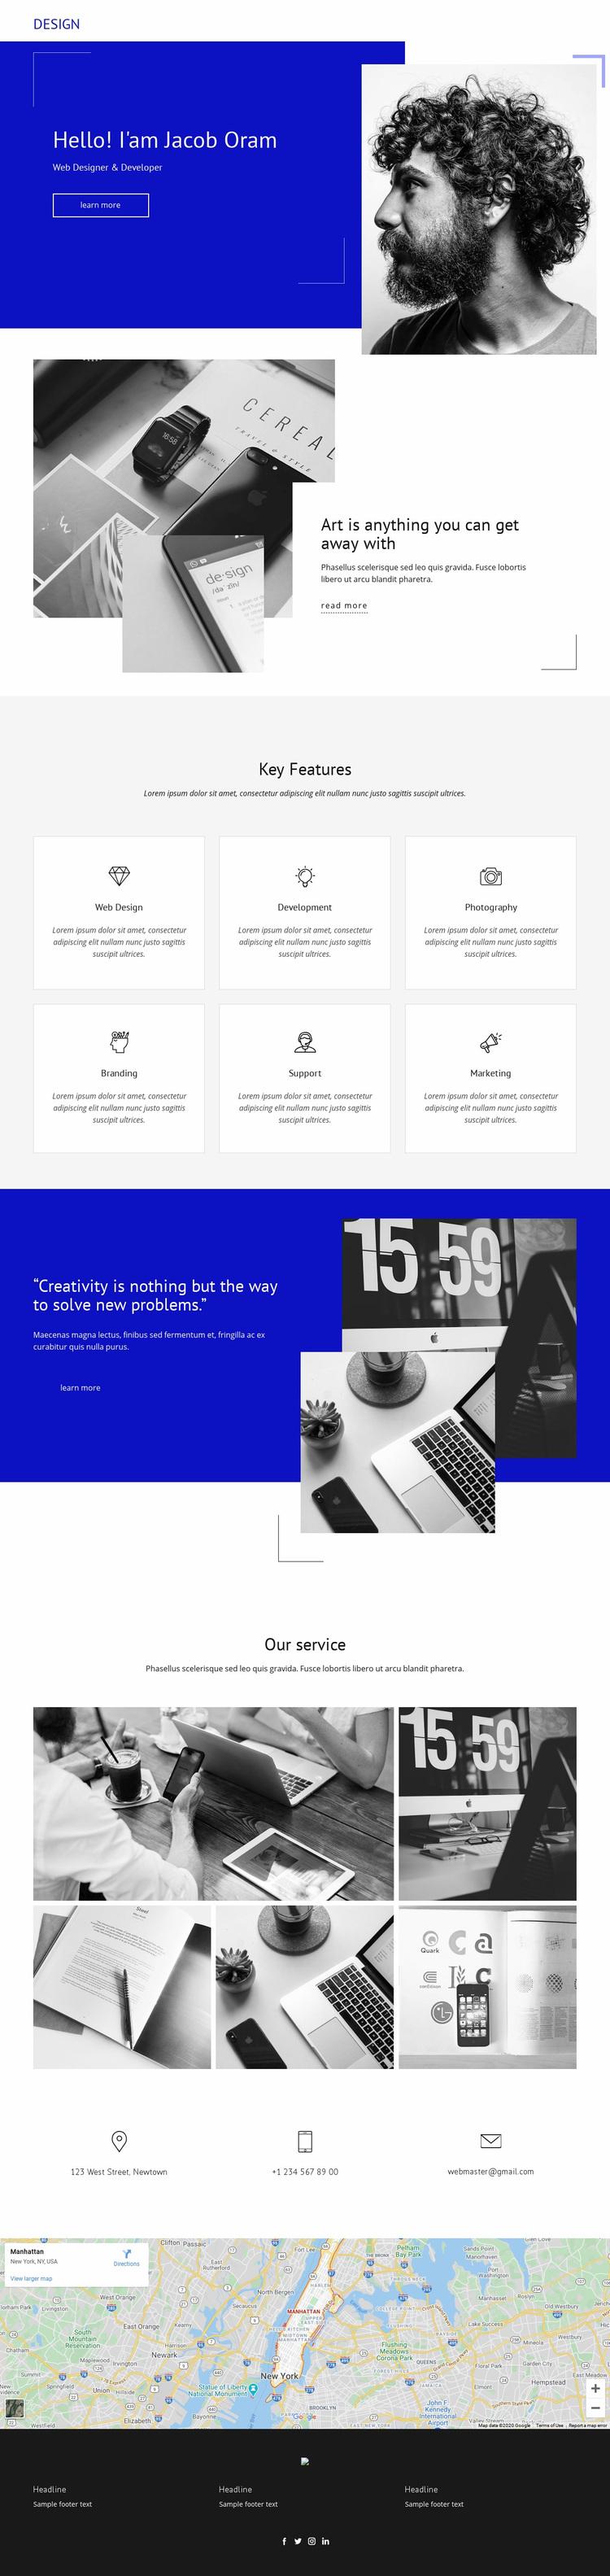 Jacob Oram Portfolio Web Page Designer